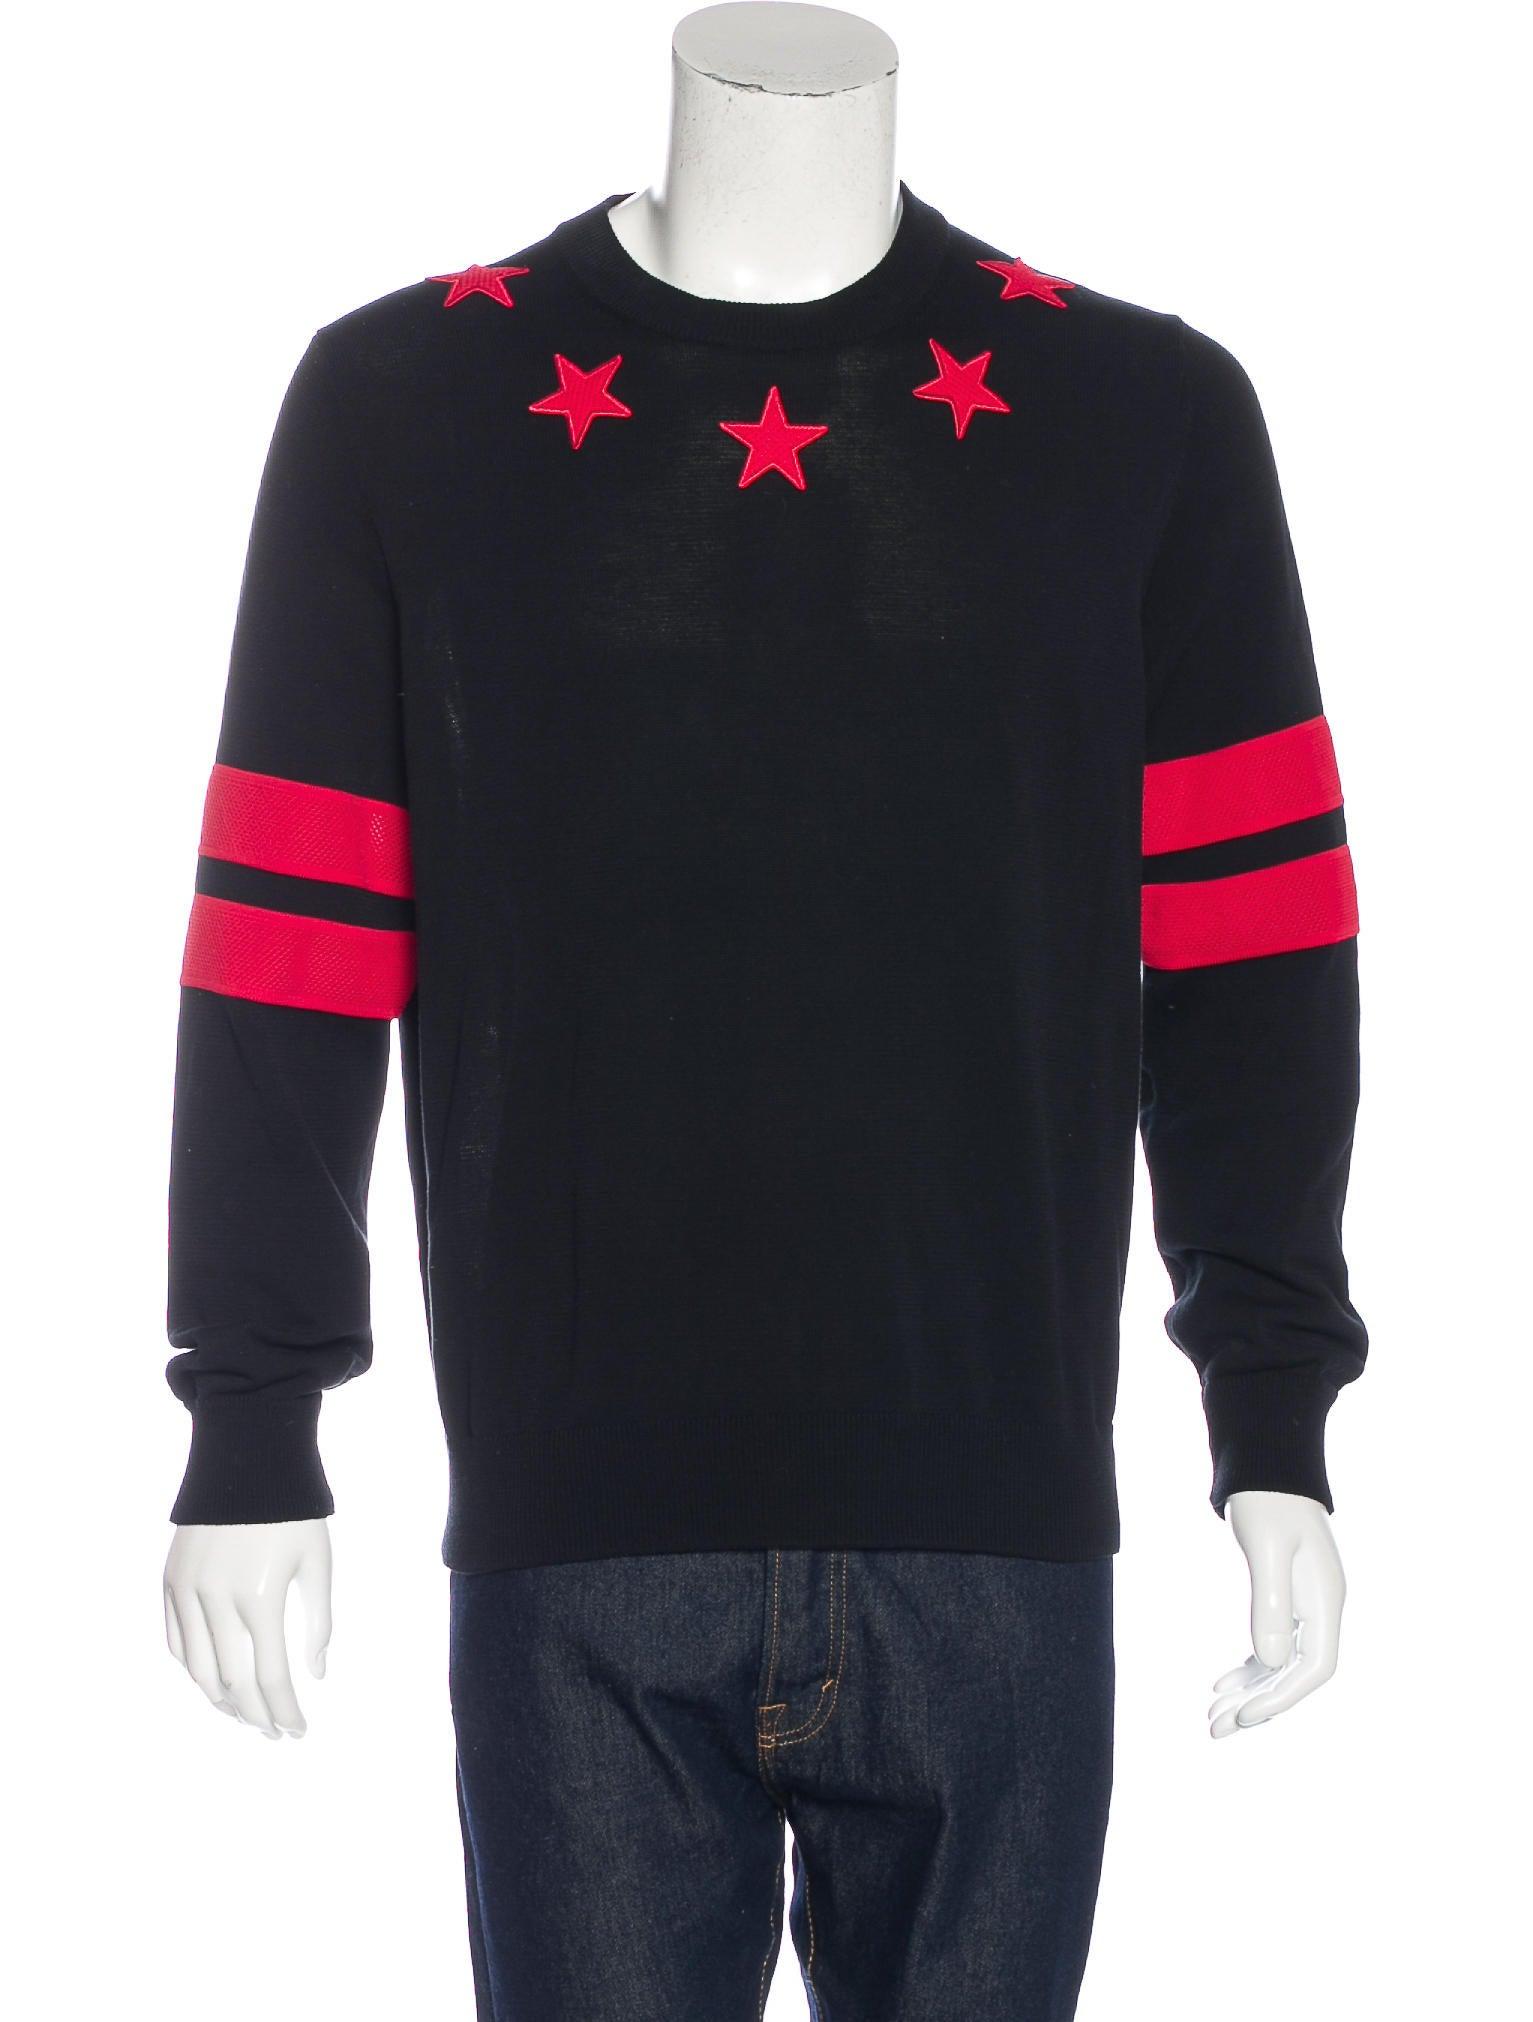 5b44e0867eb3 Givenchy Stars   Stripes Sweater - Clothing - GIV40042